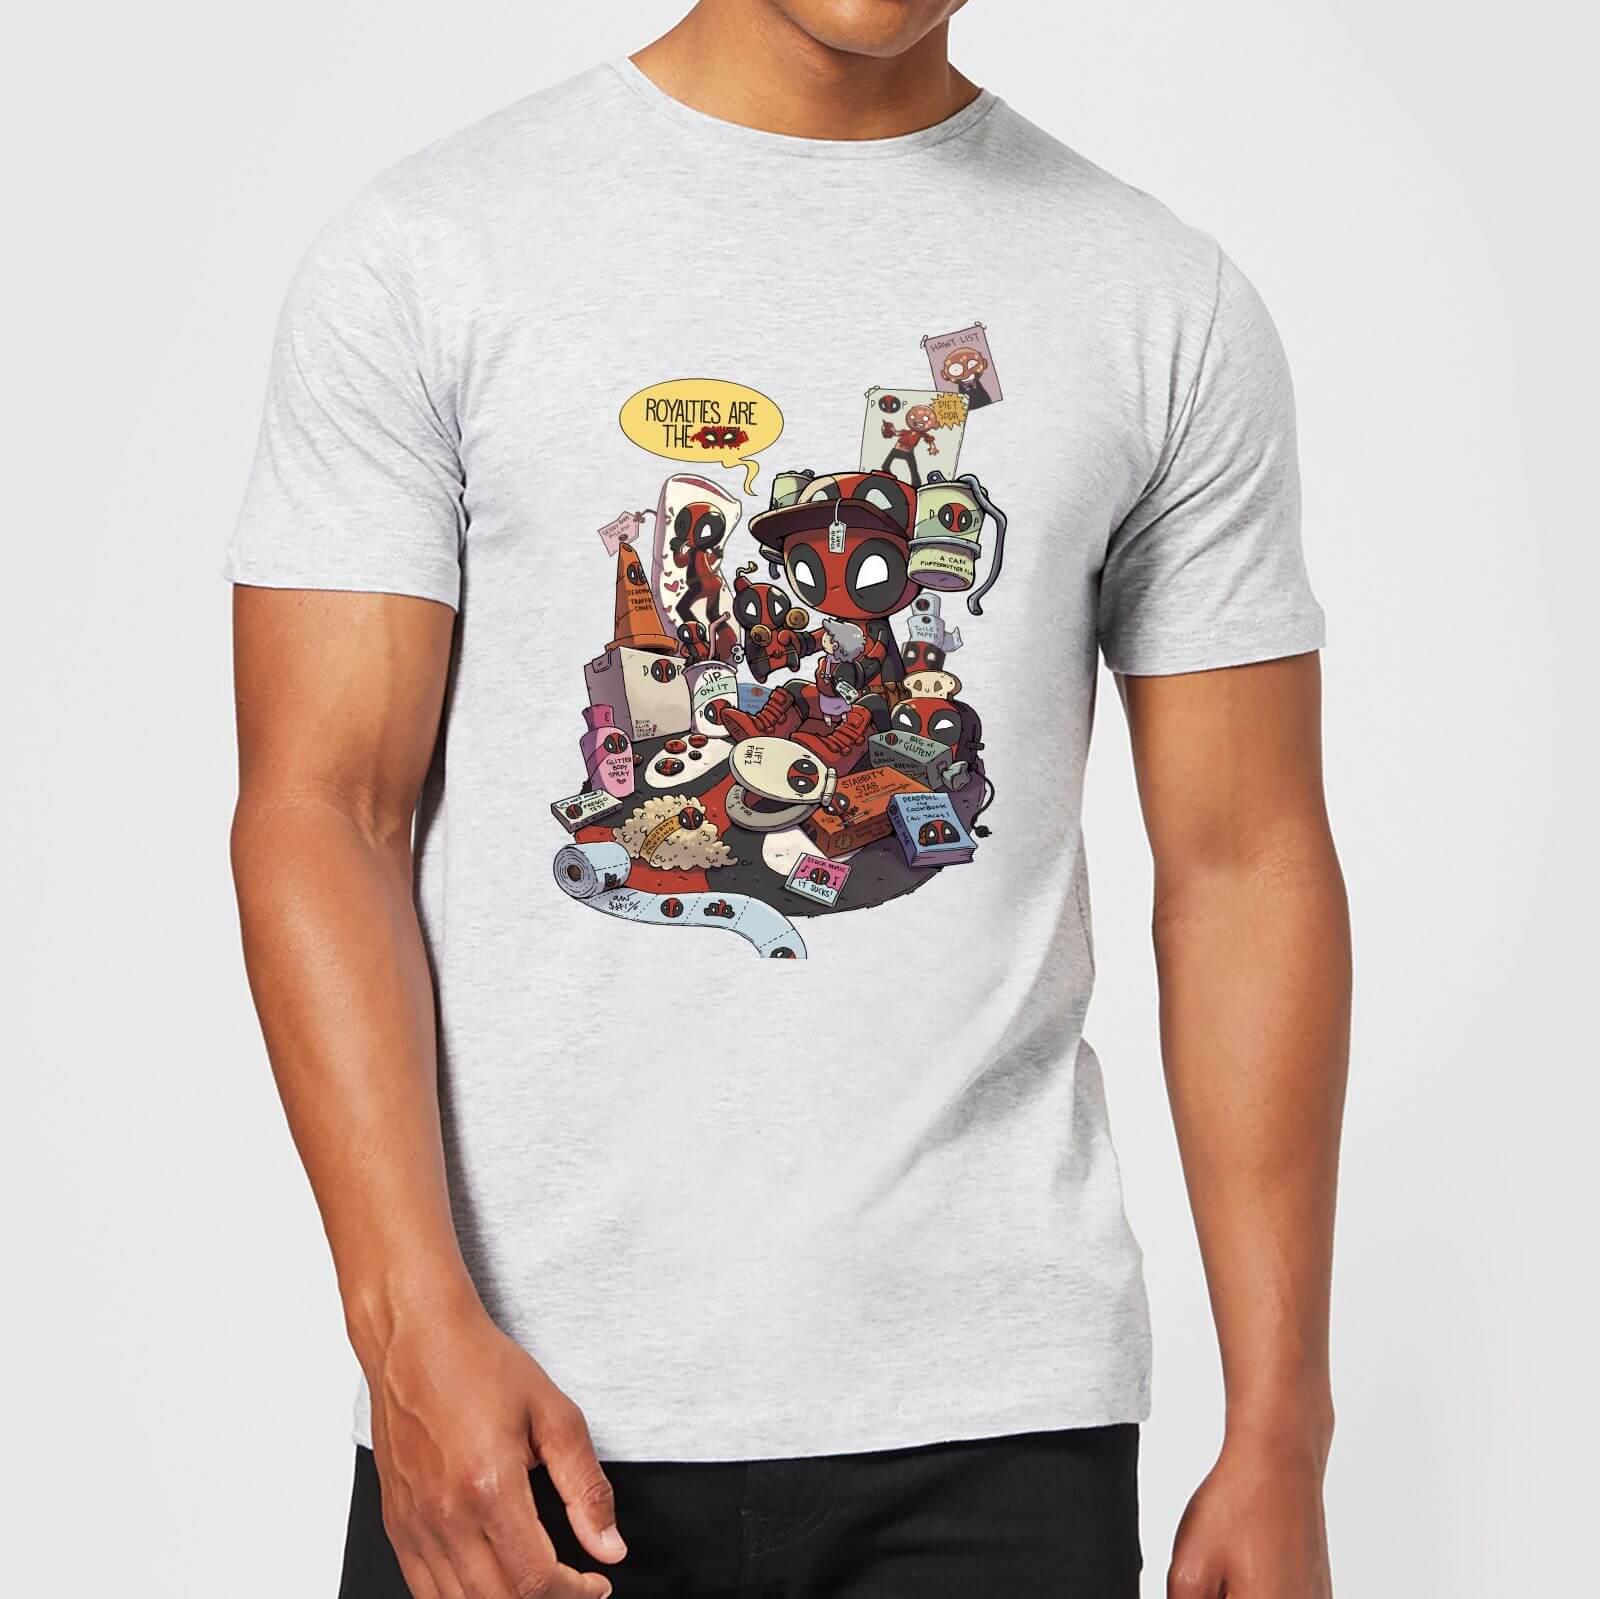 OfferteWeb.click 99-t-shirt-marvel-deadpool-merchandise-royalties-grigio